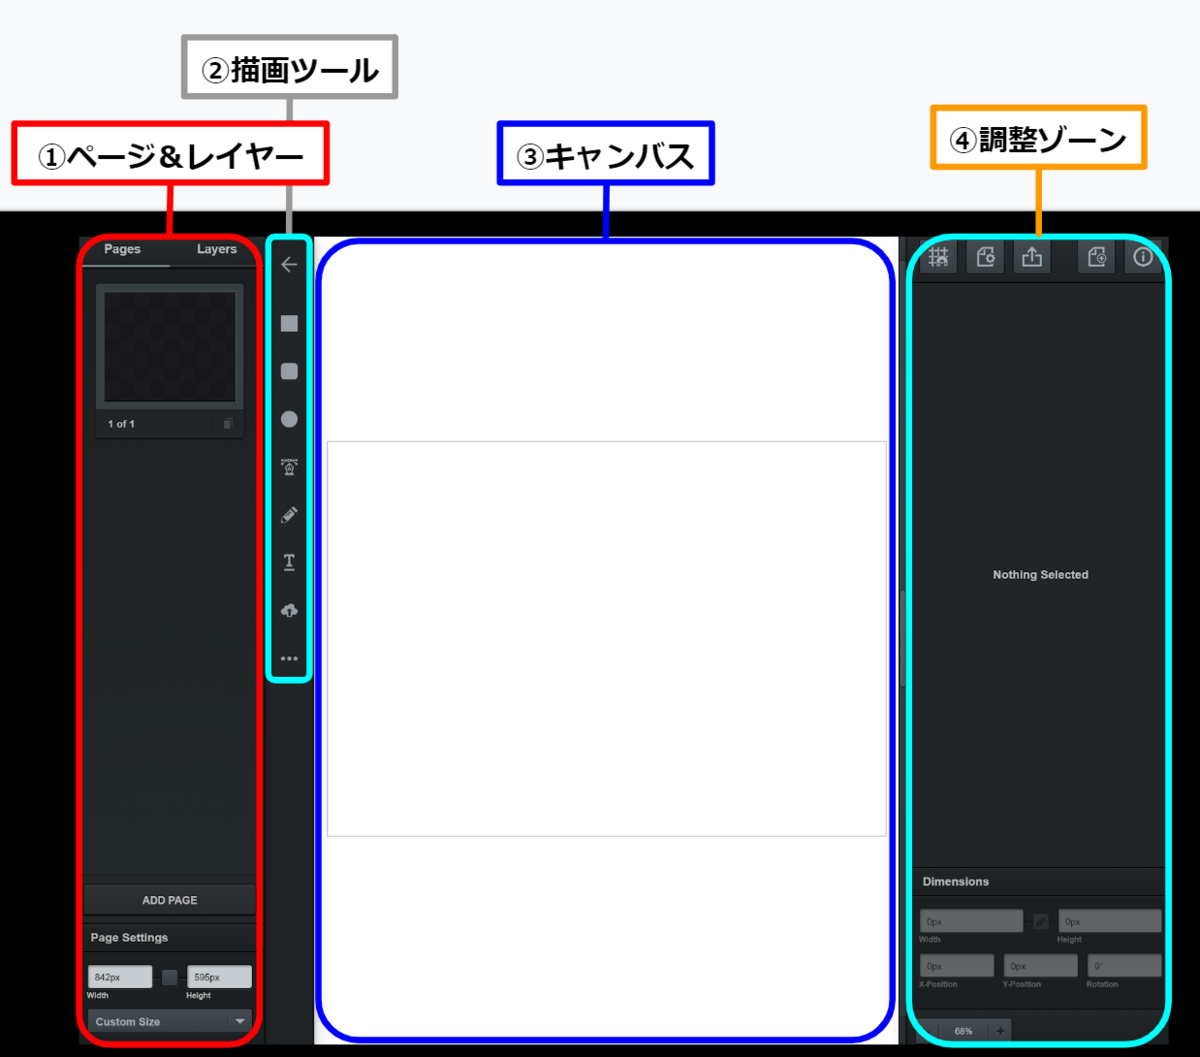 f:id:watagashitarou:20200528082610p:plain